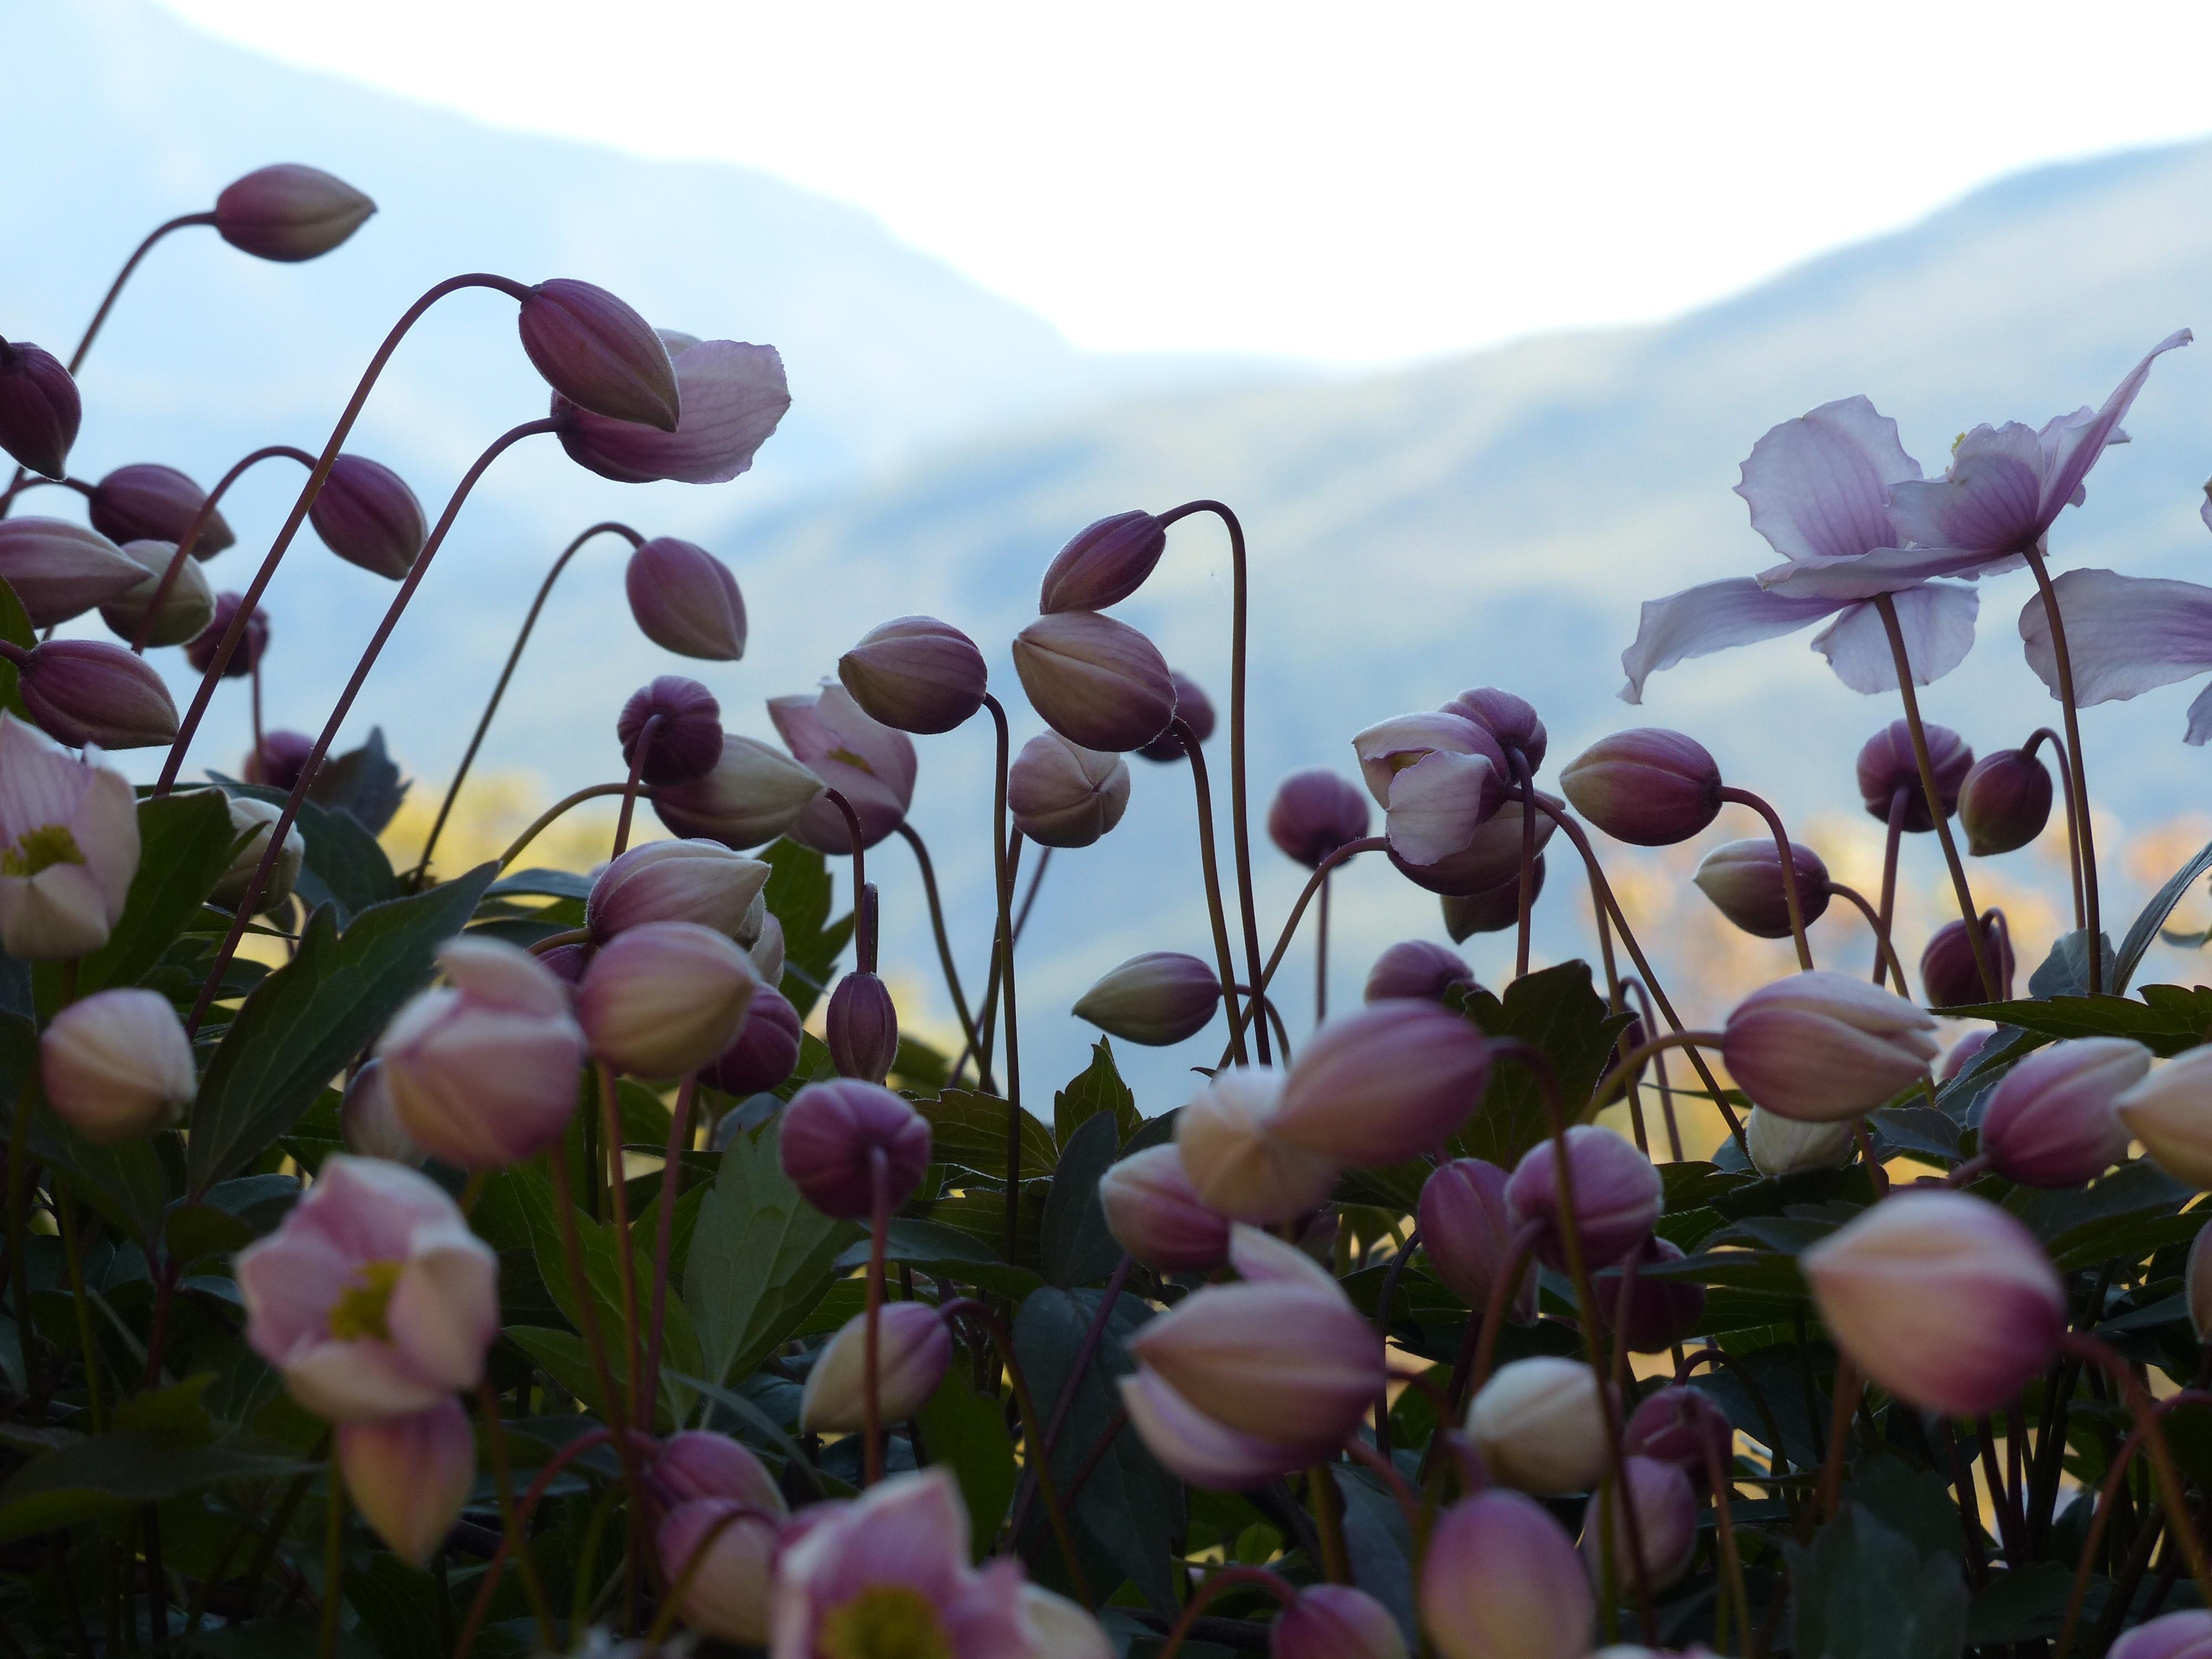 Free Images Blossom Petal Botany Pink Flora Wildflower Bud